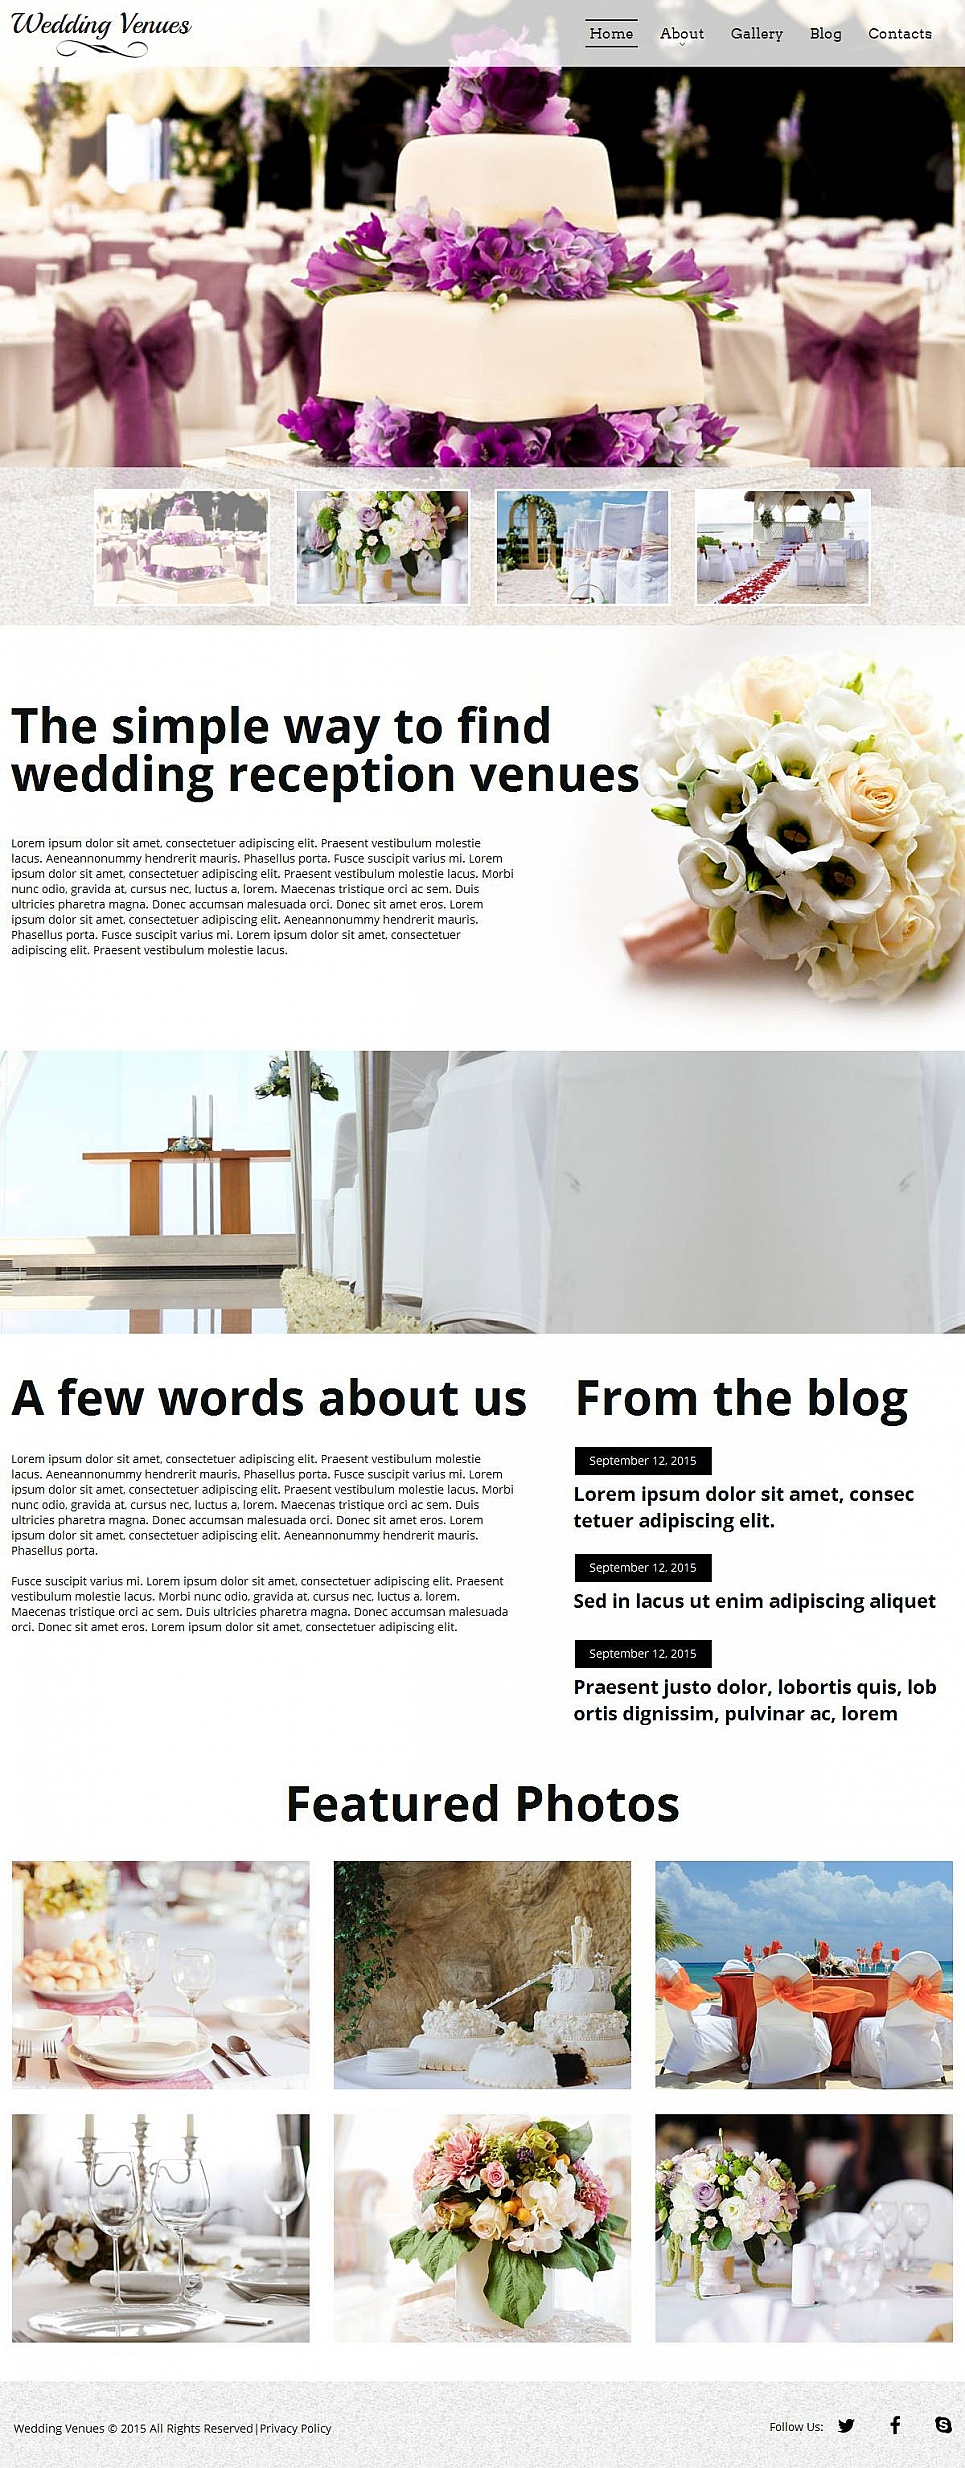 Wedding Site Template - image